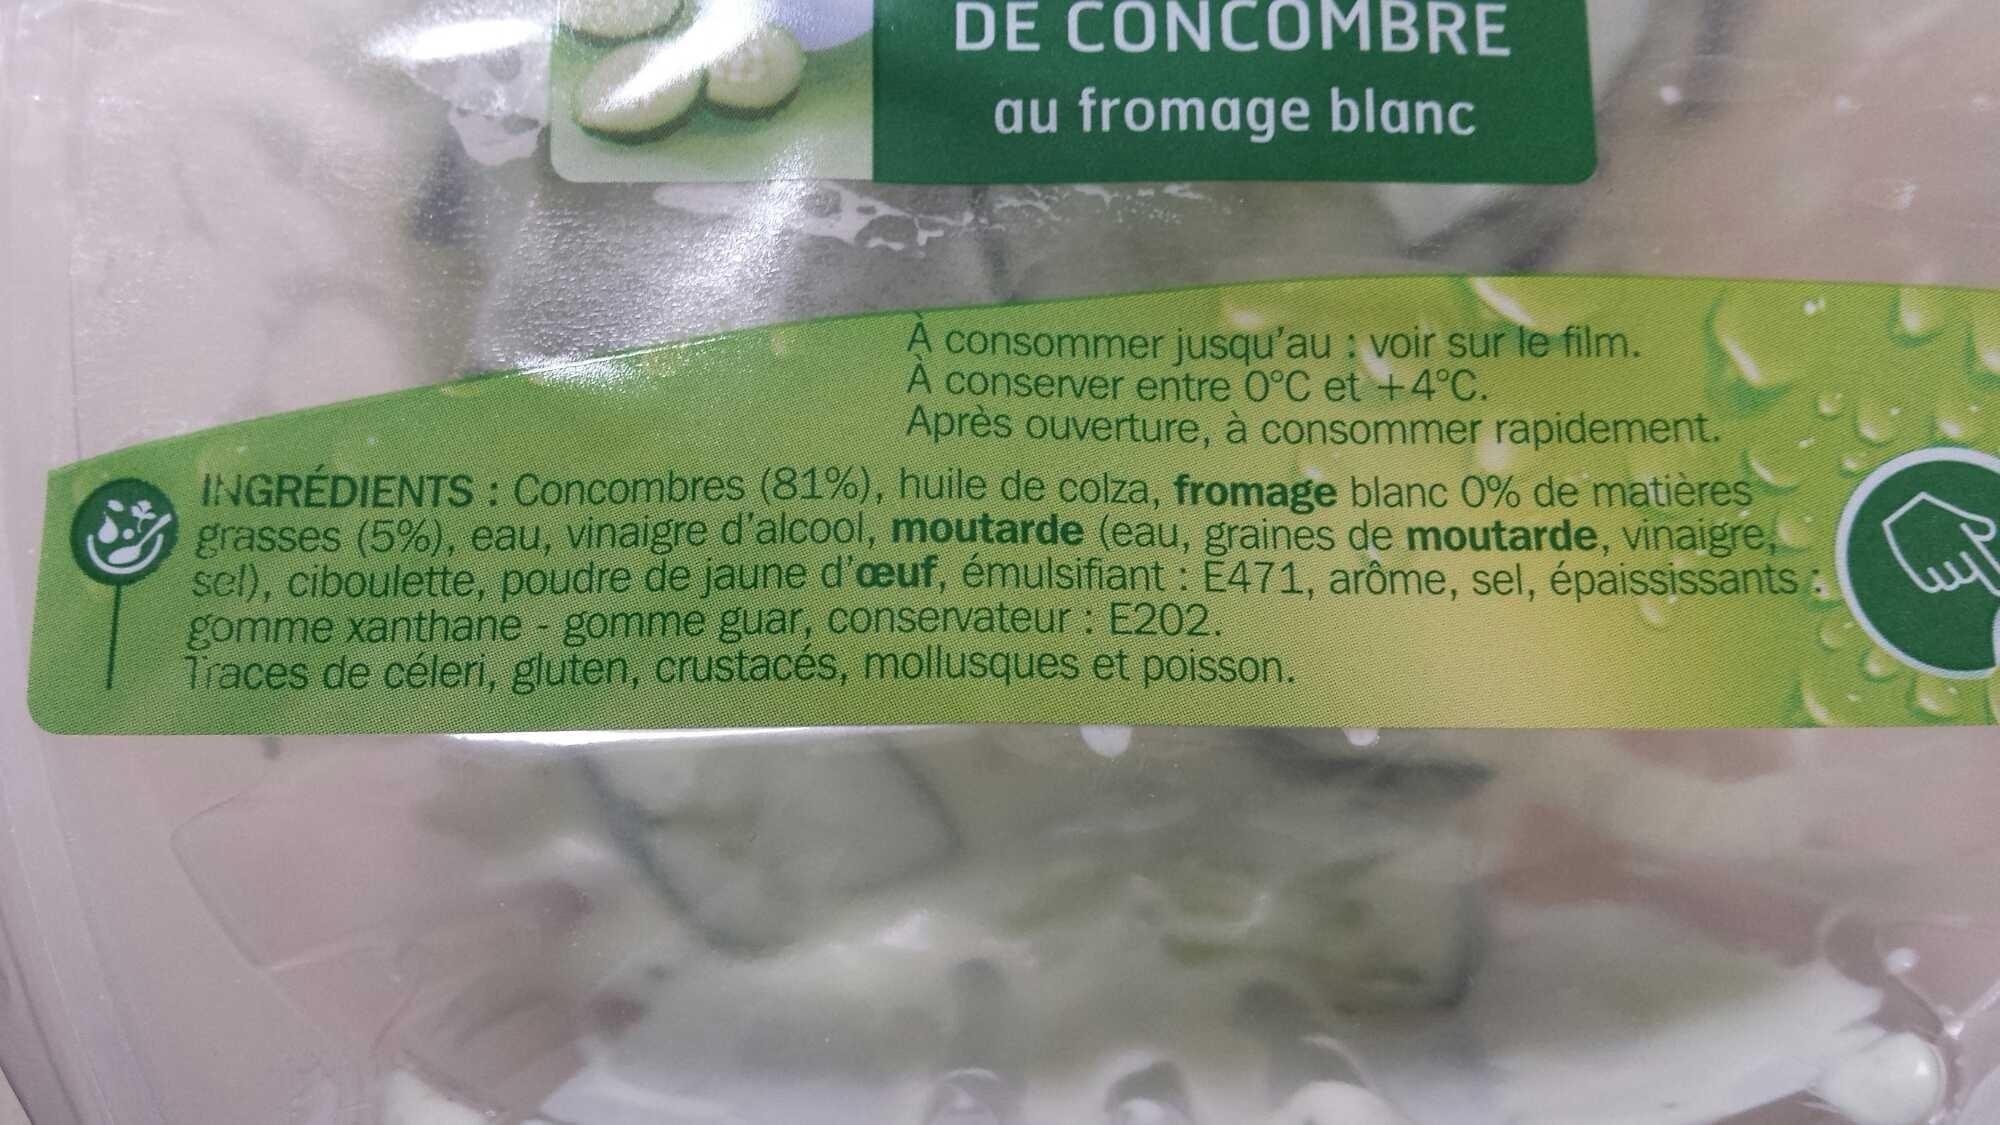 Salade de concombres au fromage blanc - Ingrediënten